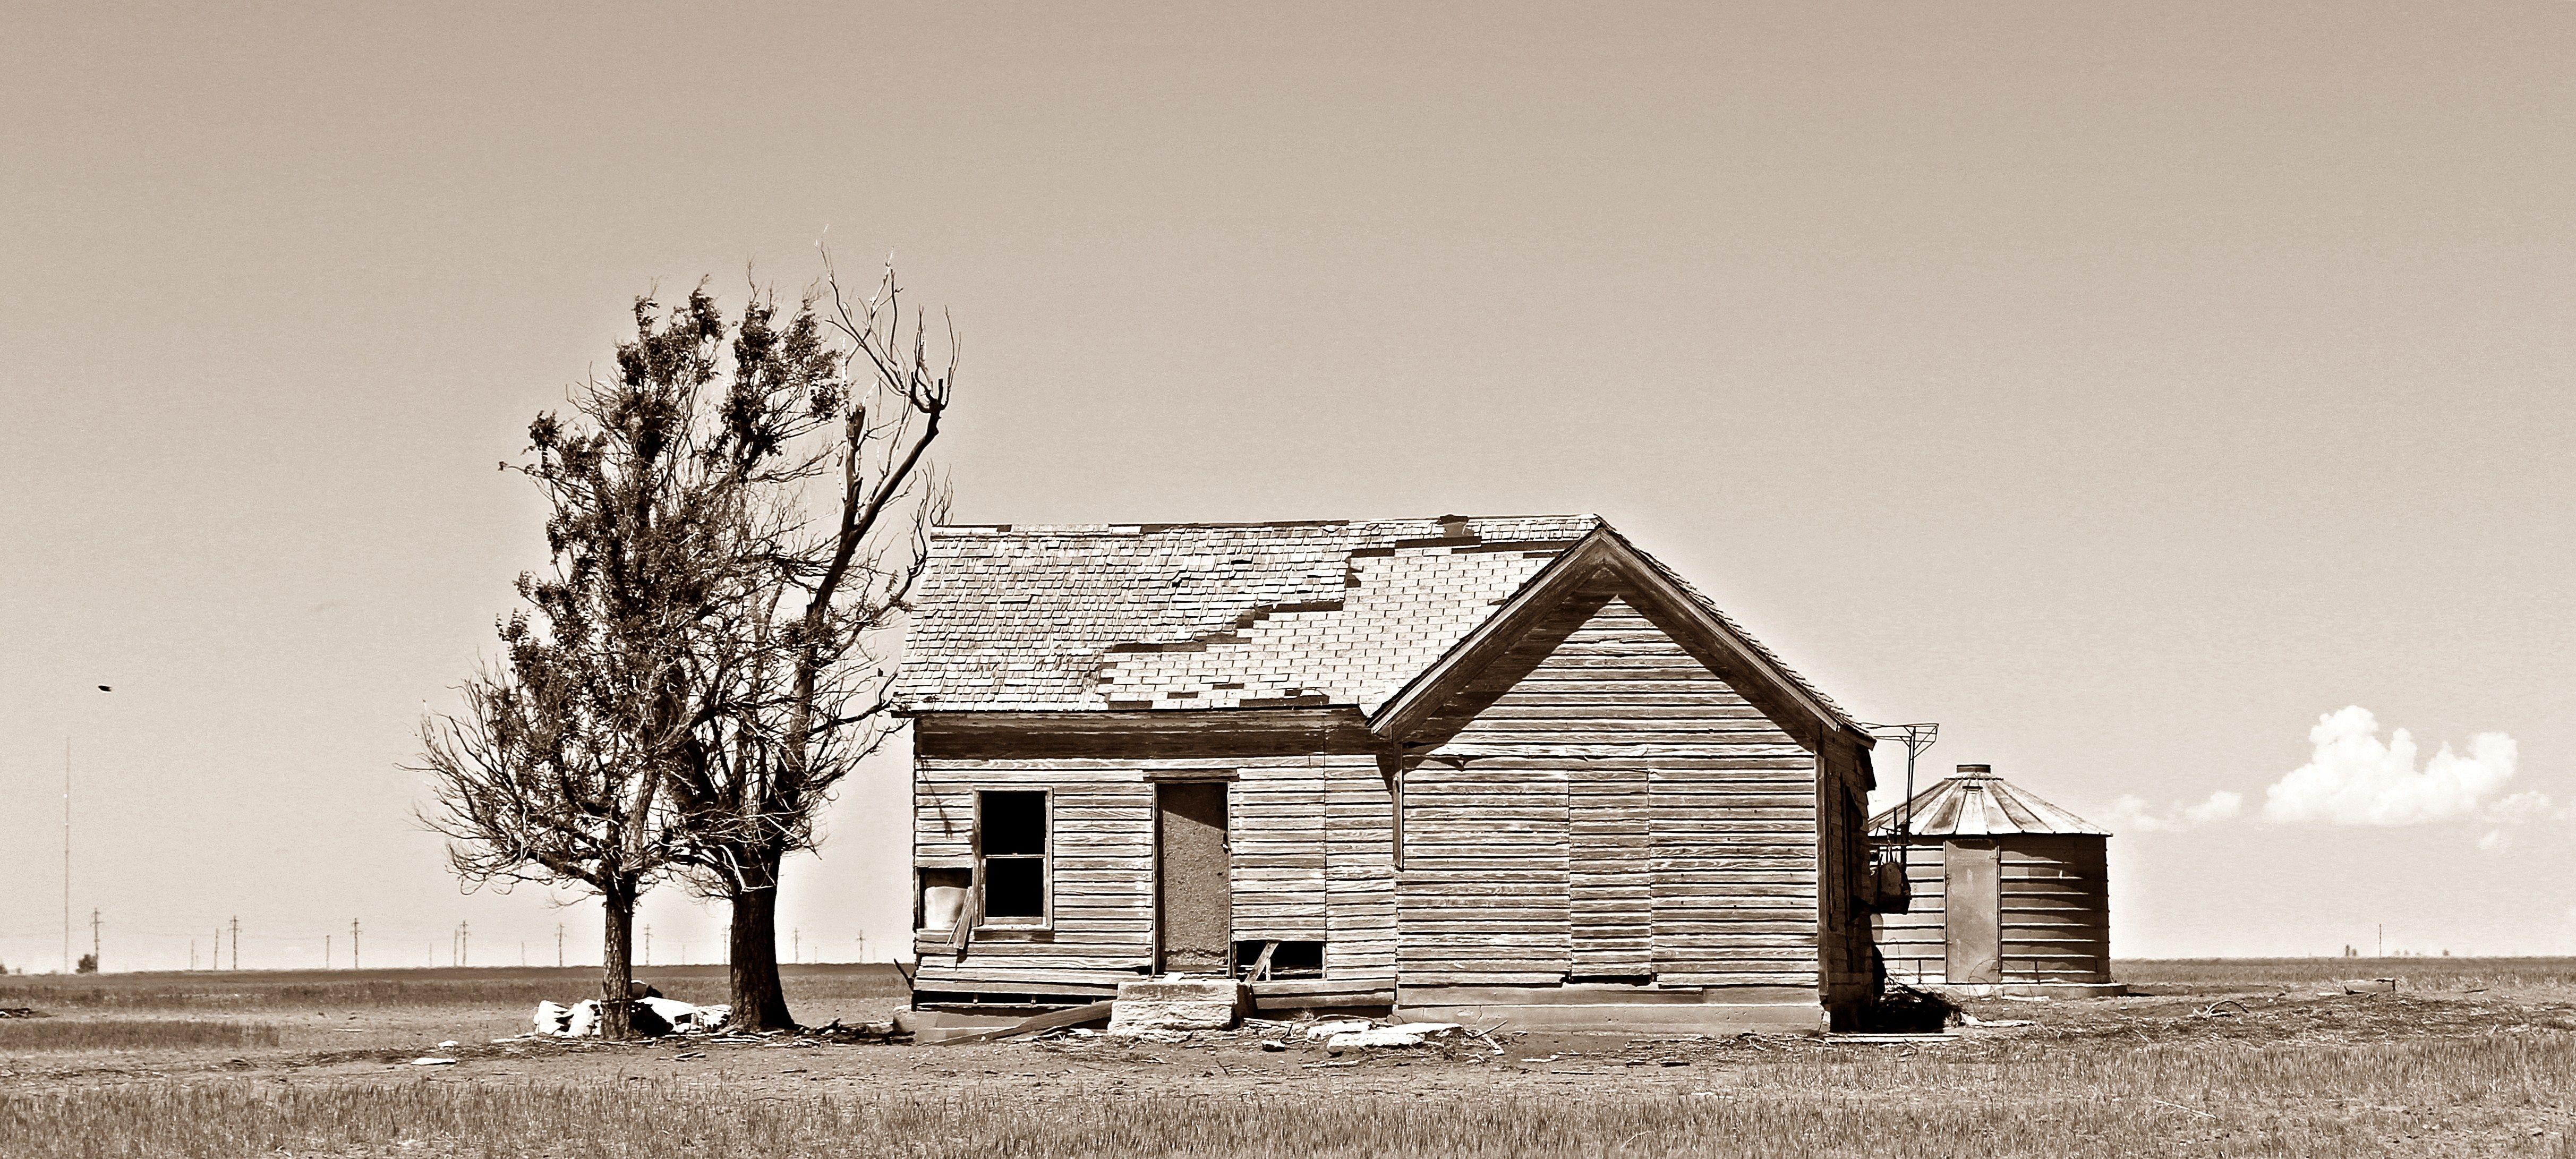 Abandoned dust bowl era farm homestead in texas county